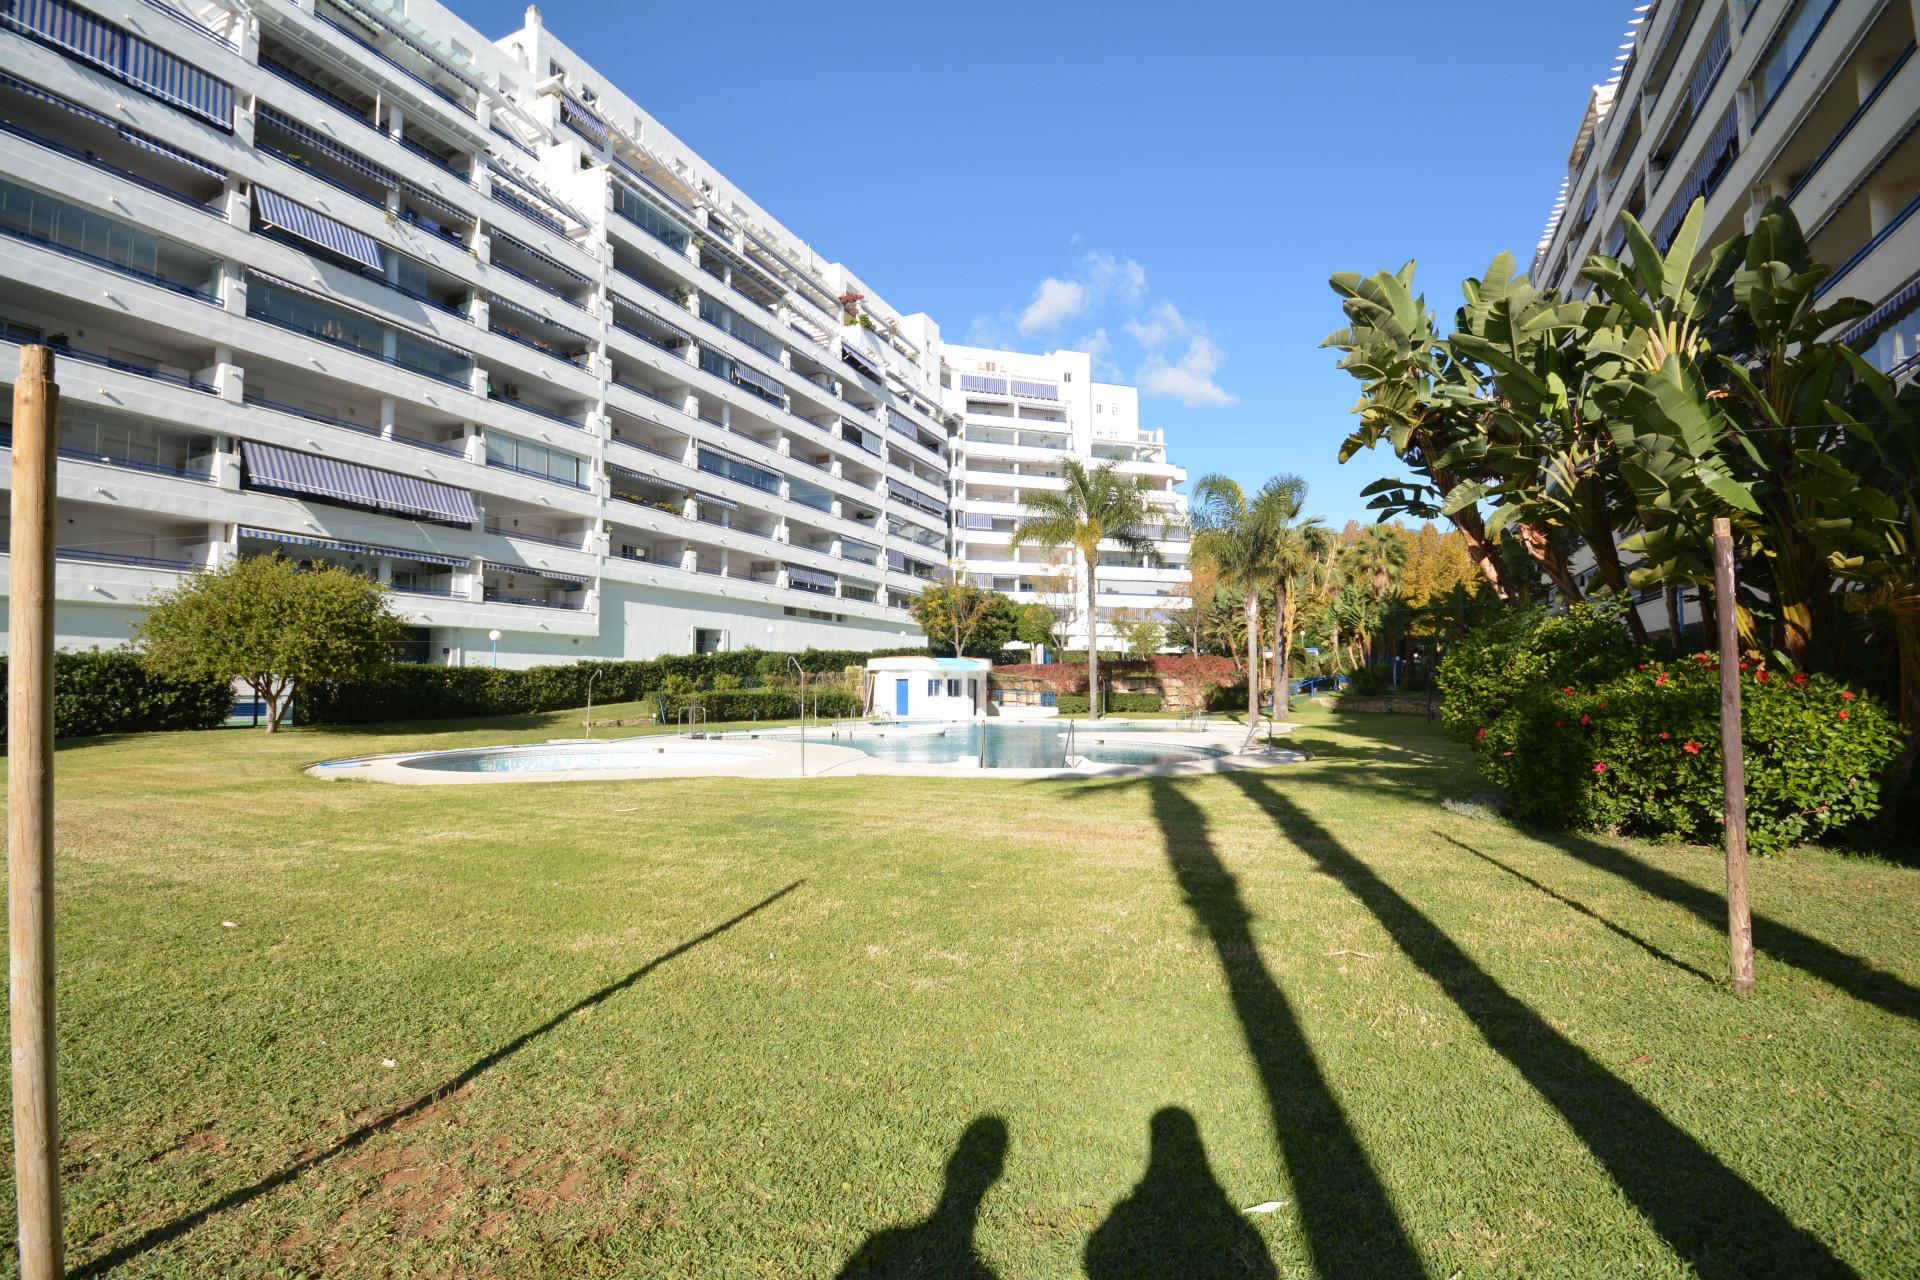 Duplex penthouse for sale in Marbella centre - Marbella Downtown